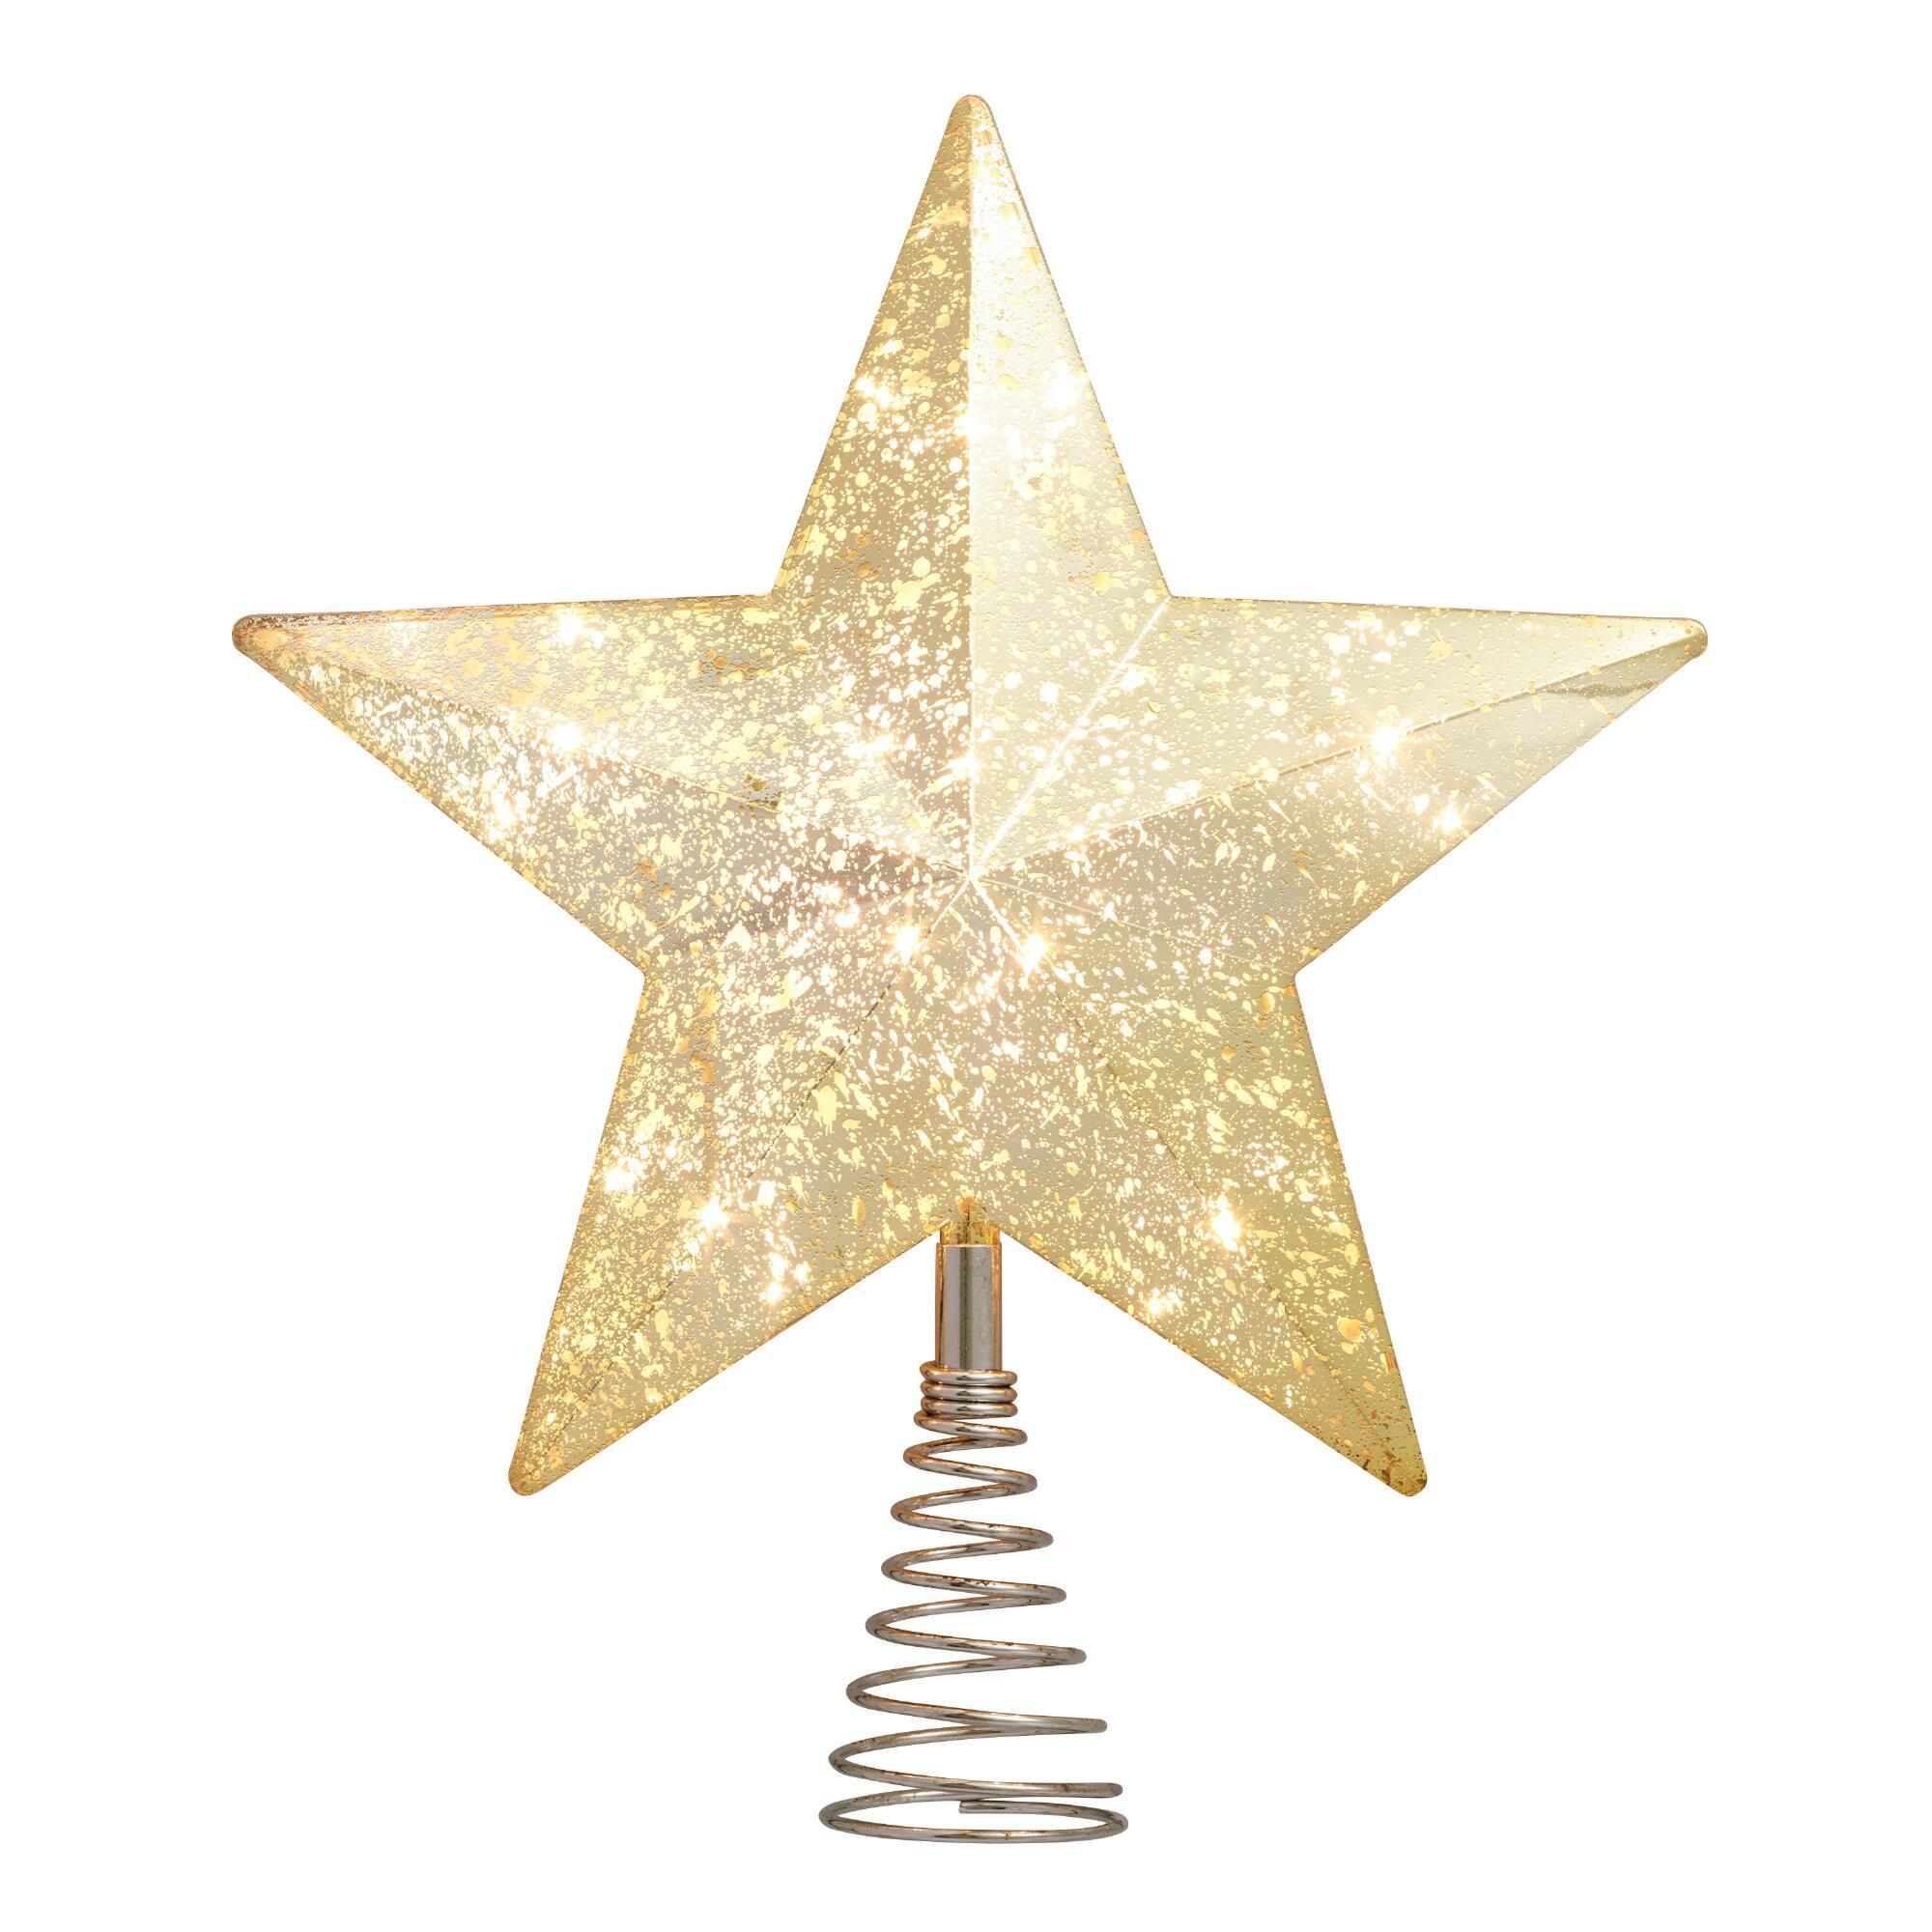 Vintage Gold Faceted Star Light Up Tree Topper $24.99